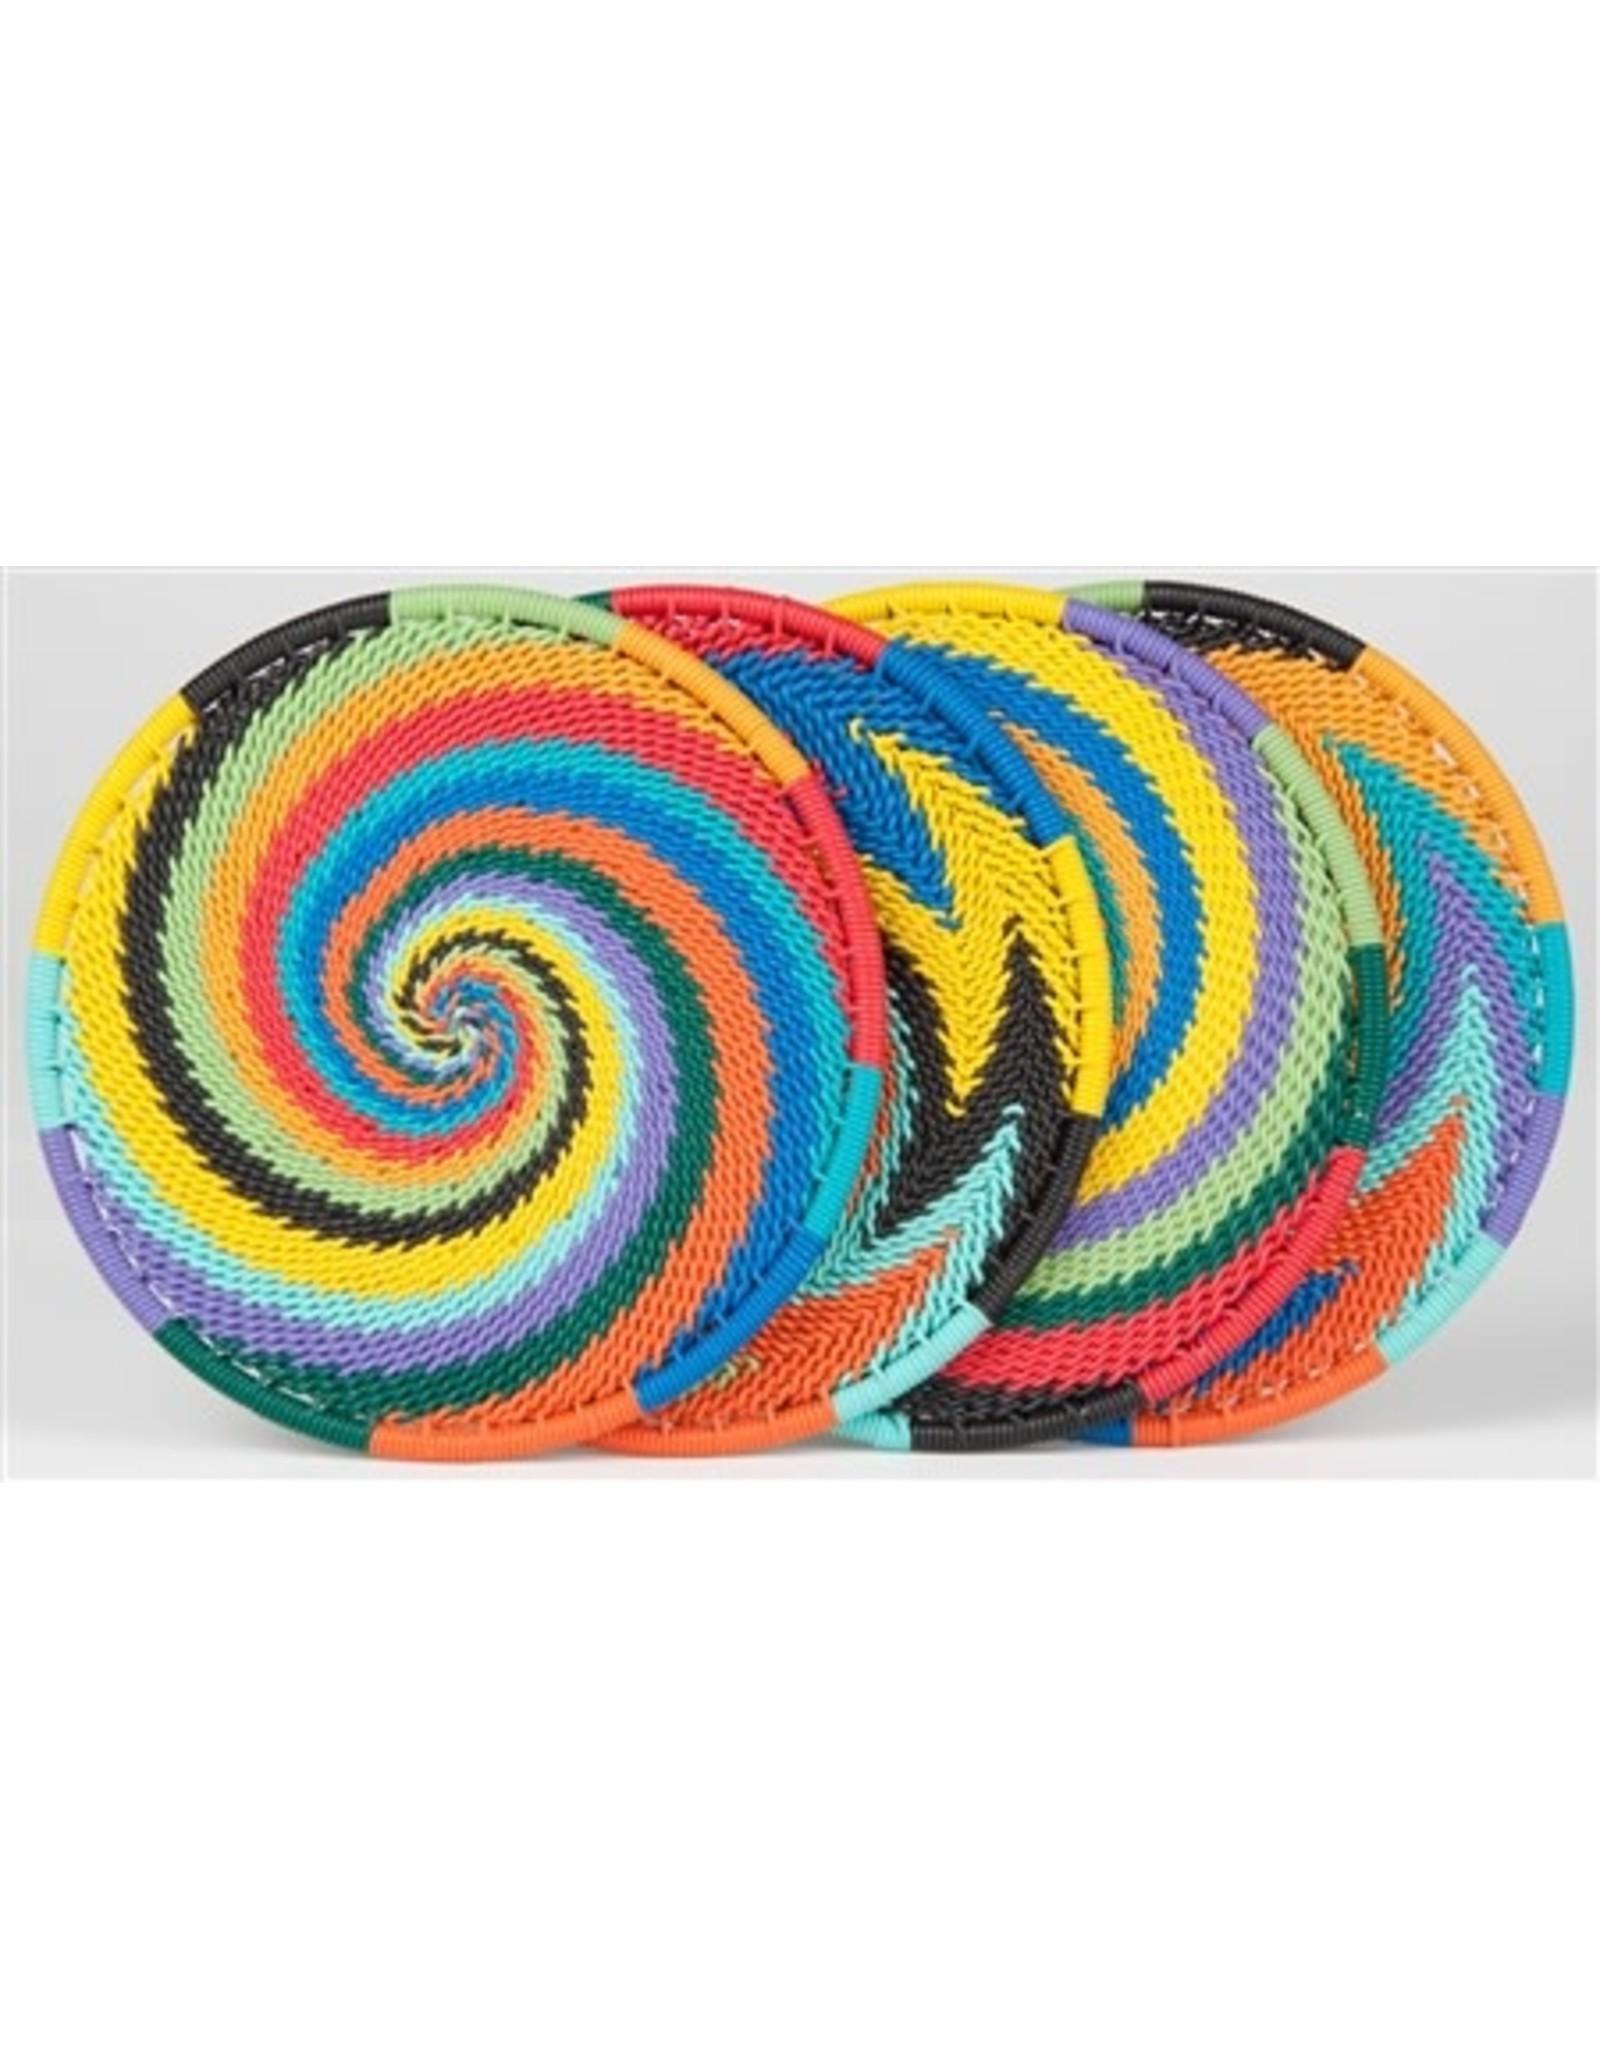 Telephone Wire Coaster  African Spirit